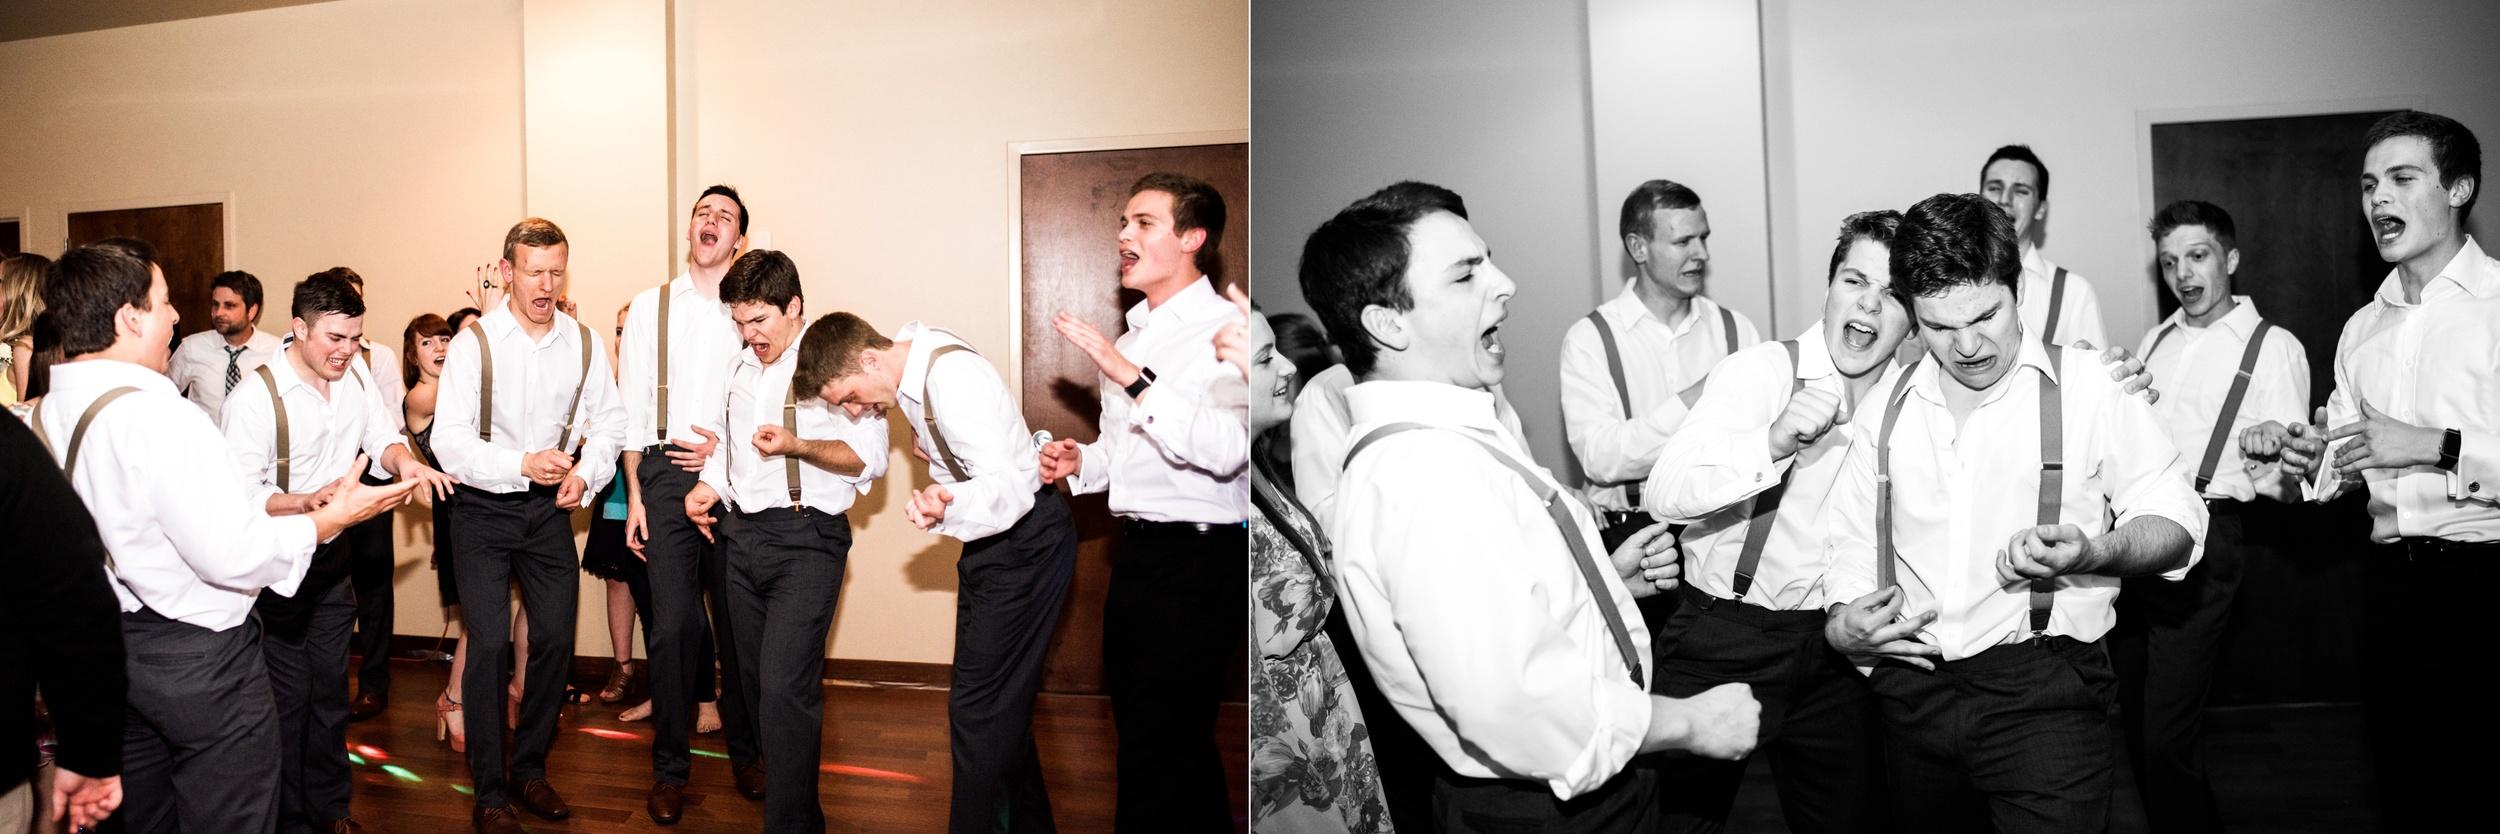 Pleasant Hill Des Moines Wedding Photographer_2207.jpg